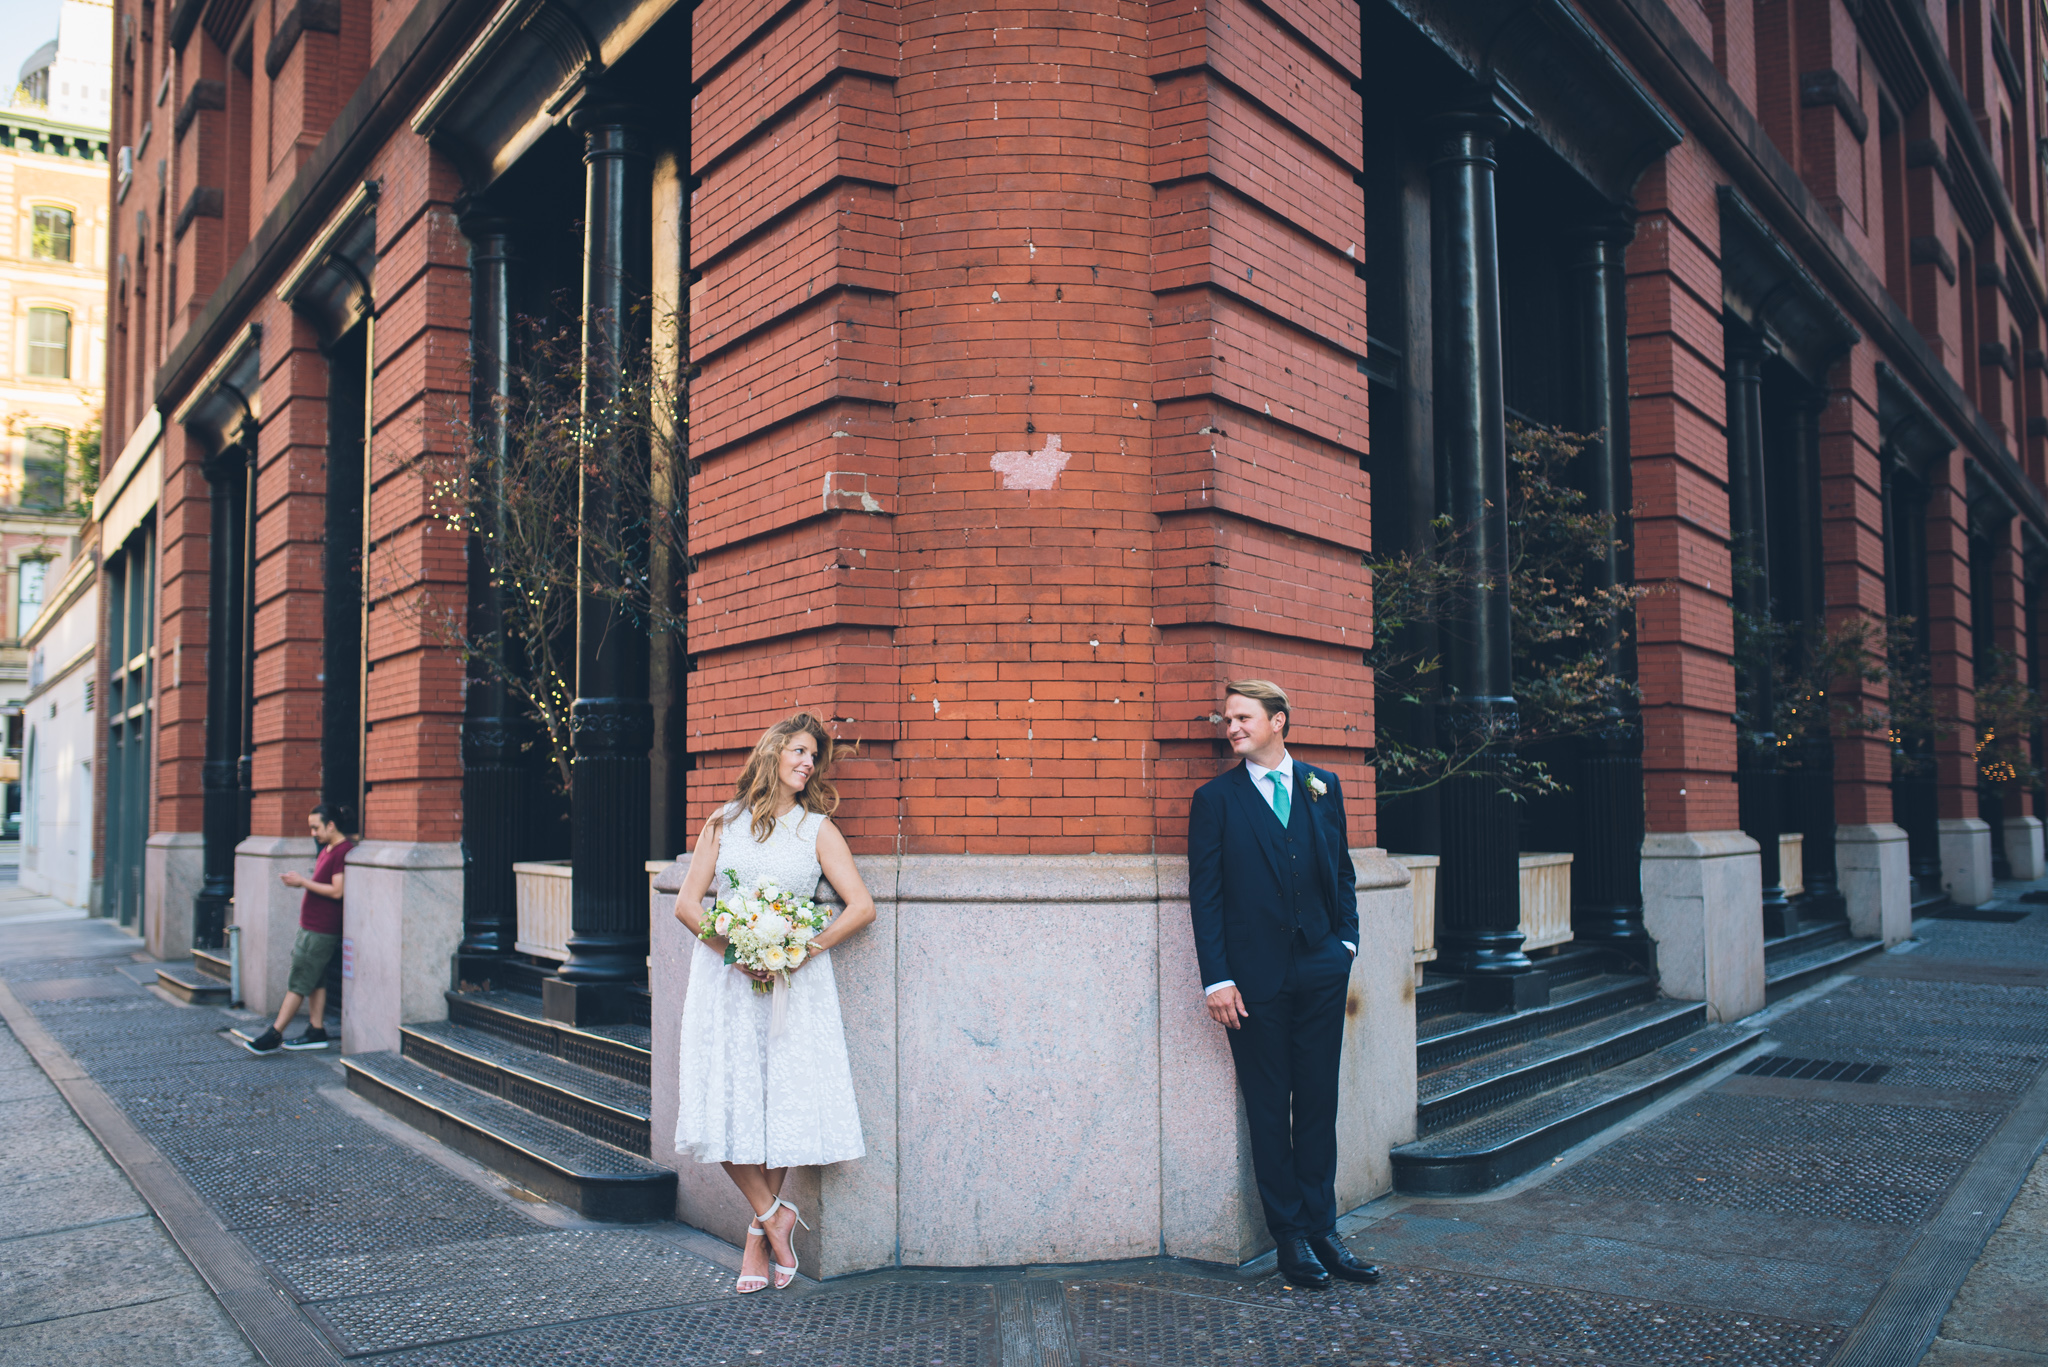 carats & cake - Katharina and Johannes' wedding